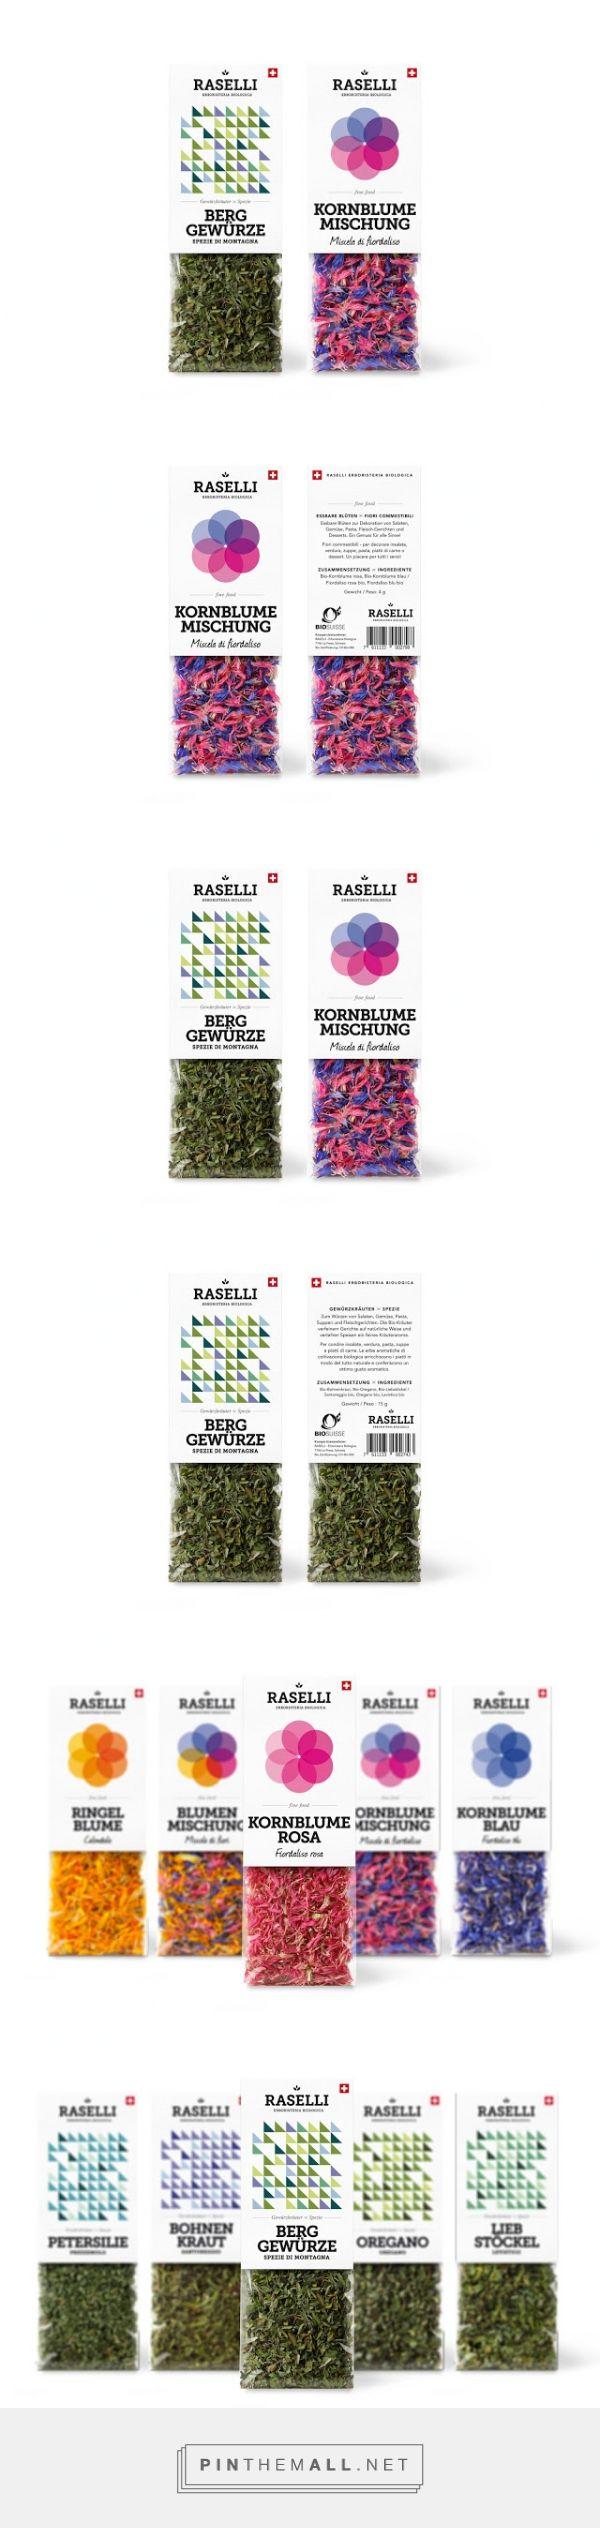 Raselli Organic Herbs & Blossoms